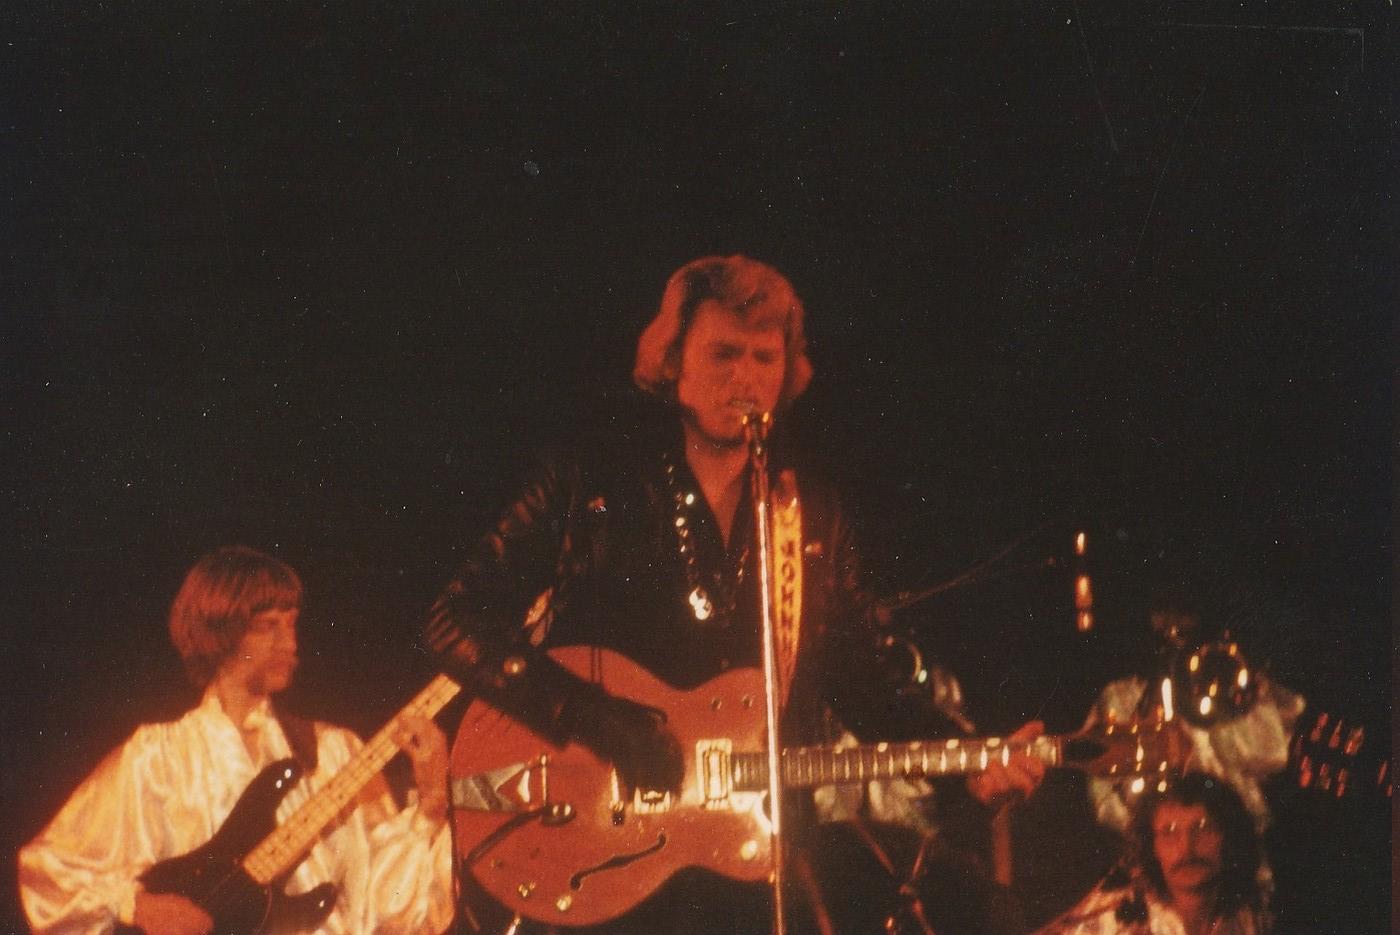 INÉDIT  :  JOHNNY HALLYDAY EN TOURNEE - HIVER 1978 -1979 ( PHOTOS INÉDITES )   Img_2633